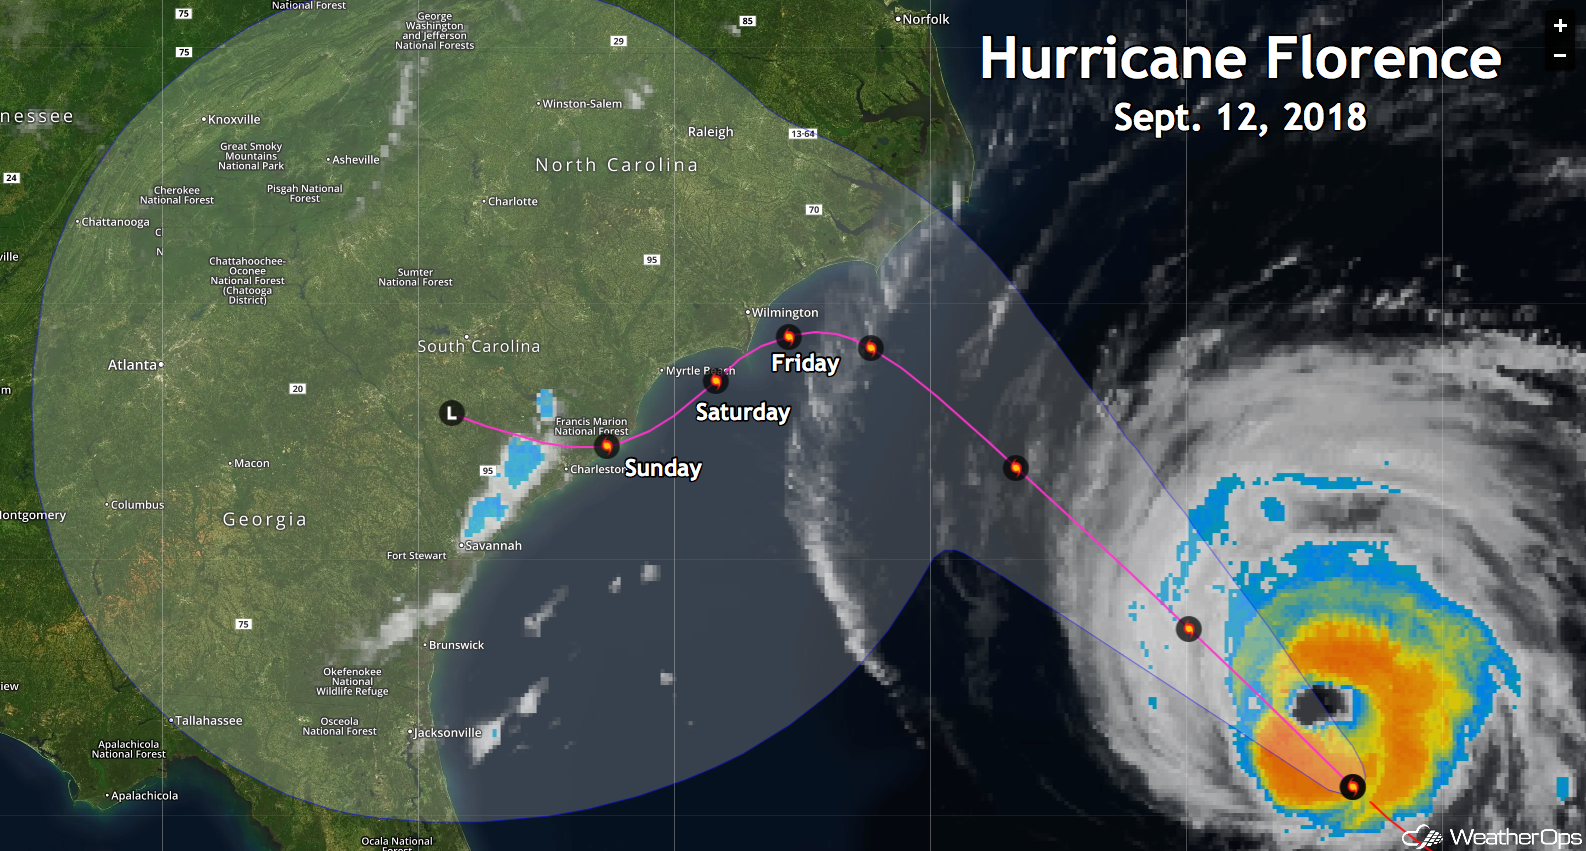 WeatherOps Path of Hurricane Florence